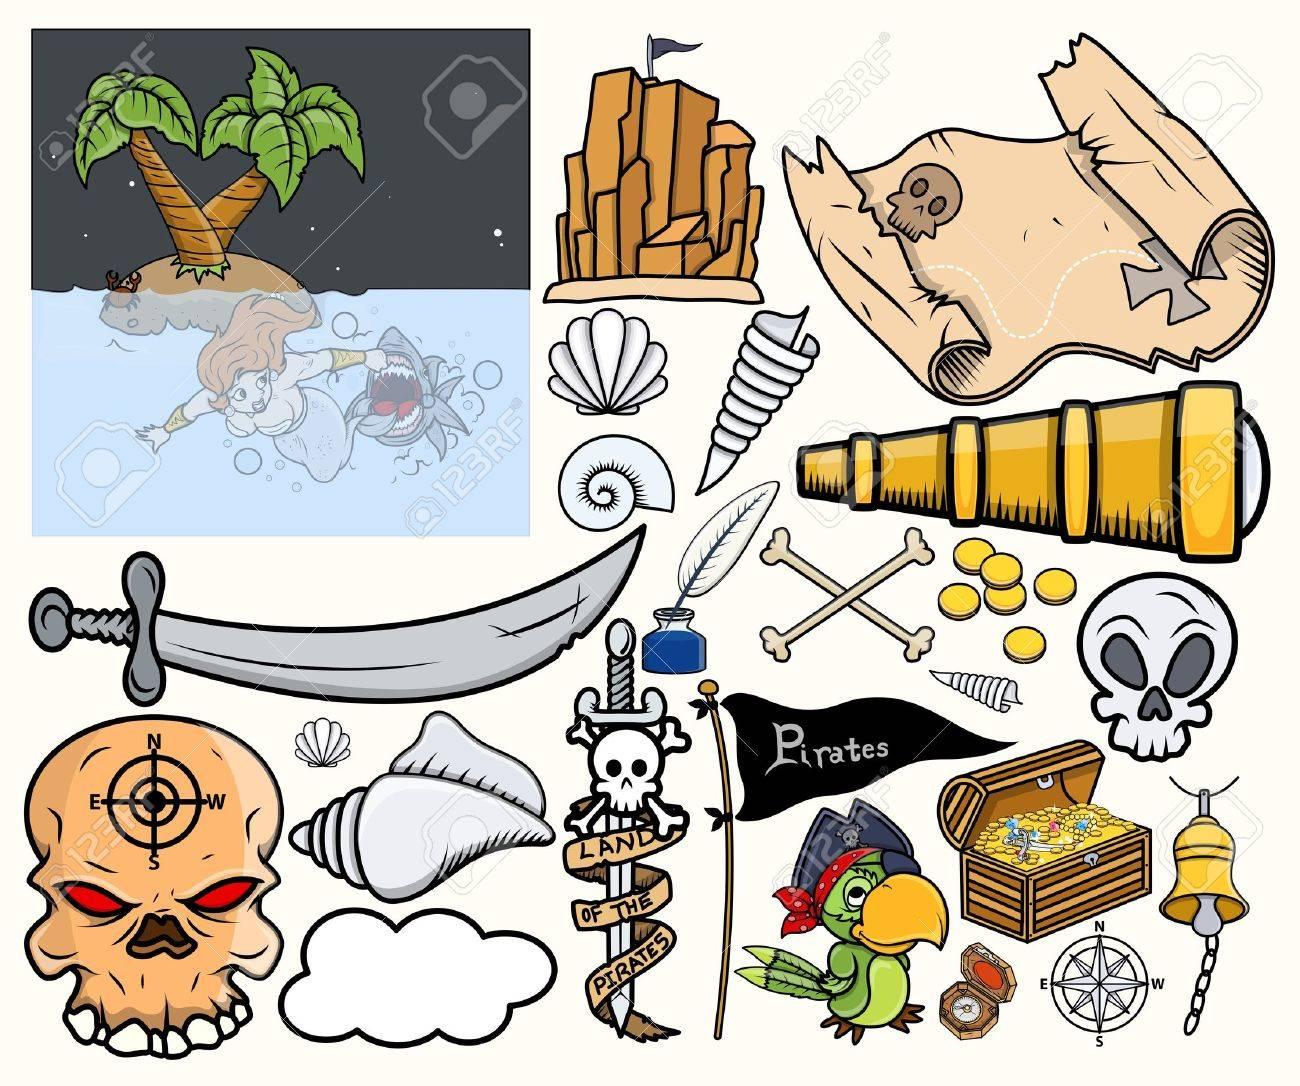 Pirate Treasure Hunt Vector Illustrations Set Stock Vector - 21505897